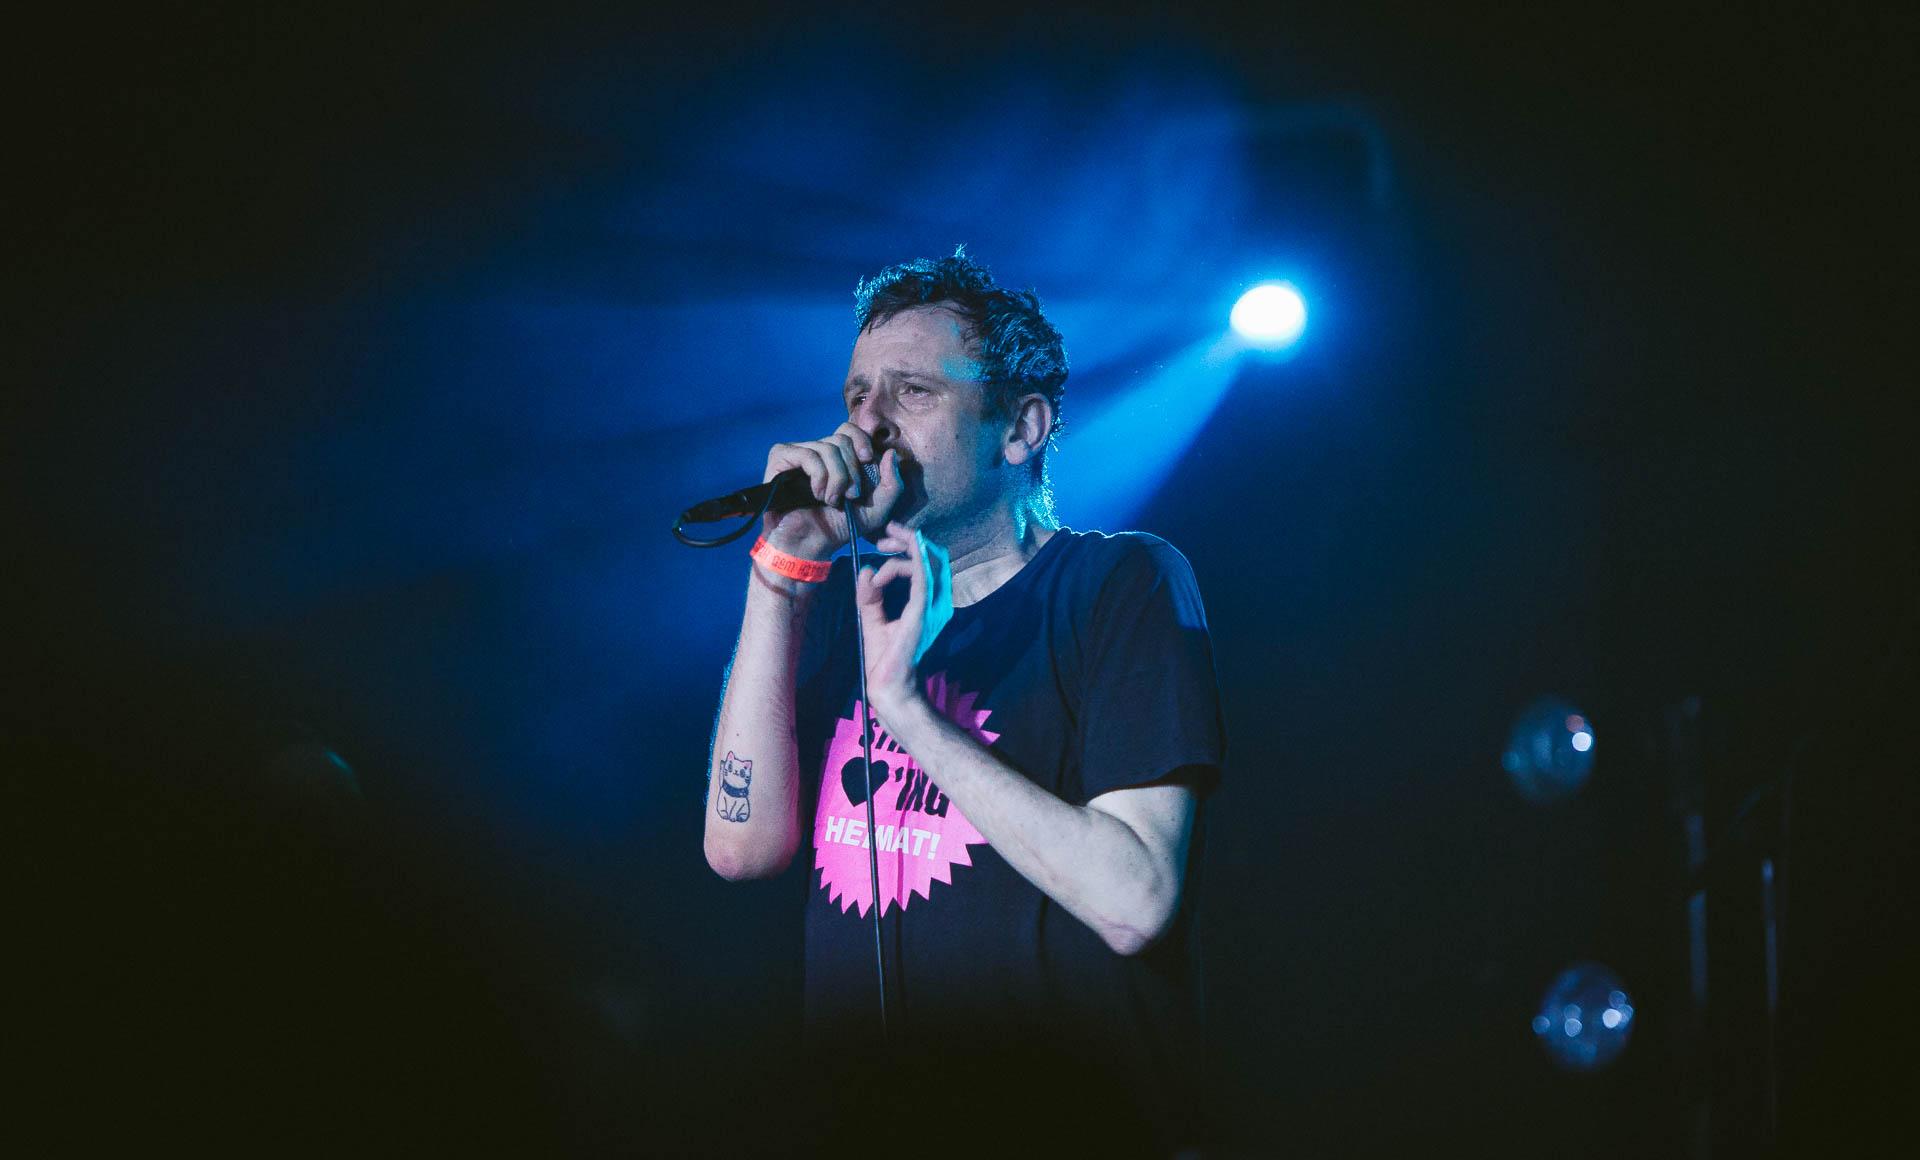 Torsun von Egotronic Live Festsaal Kreuzberg Tobi Bohn Konzertfotograf